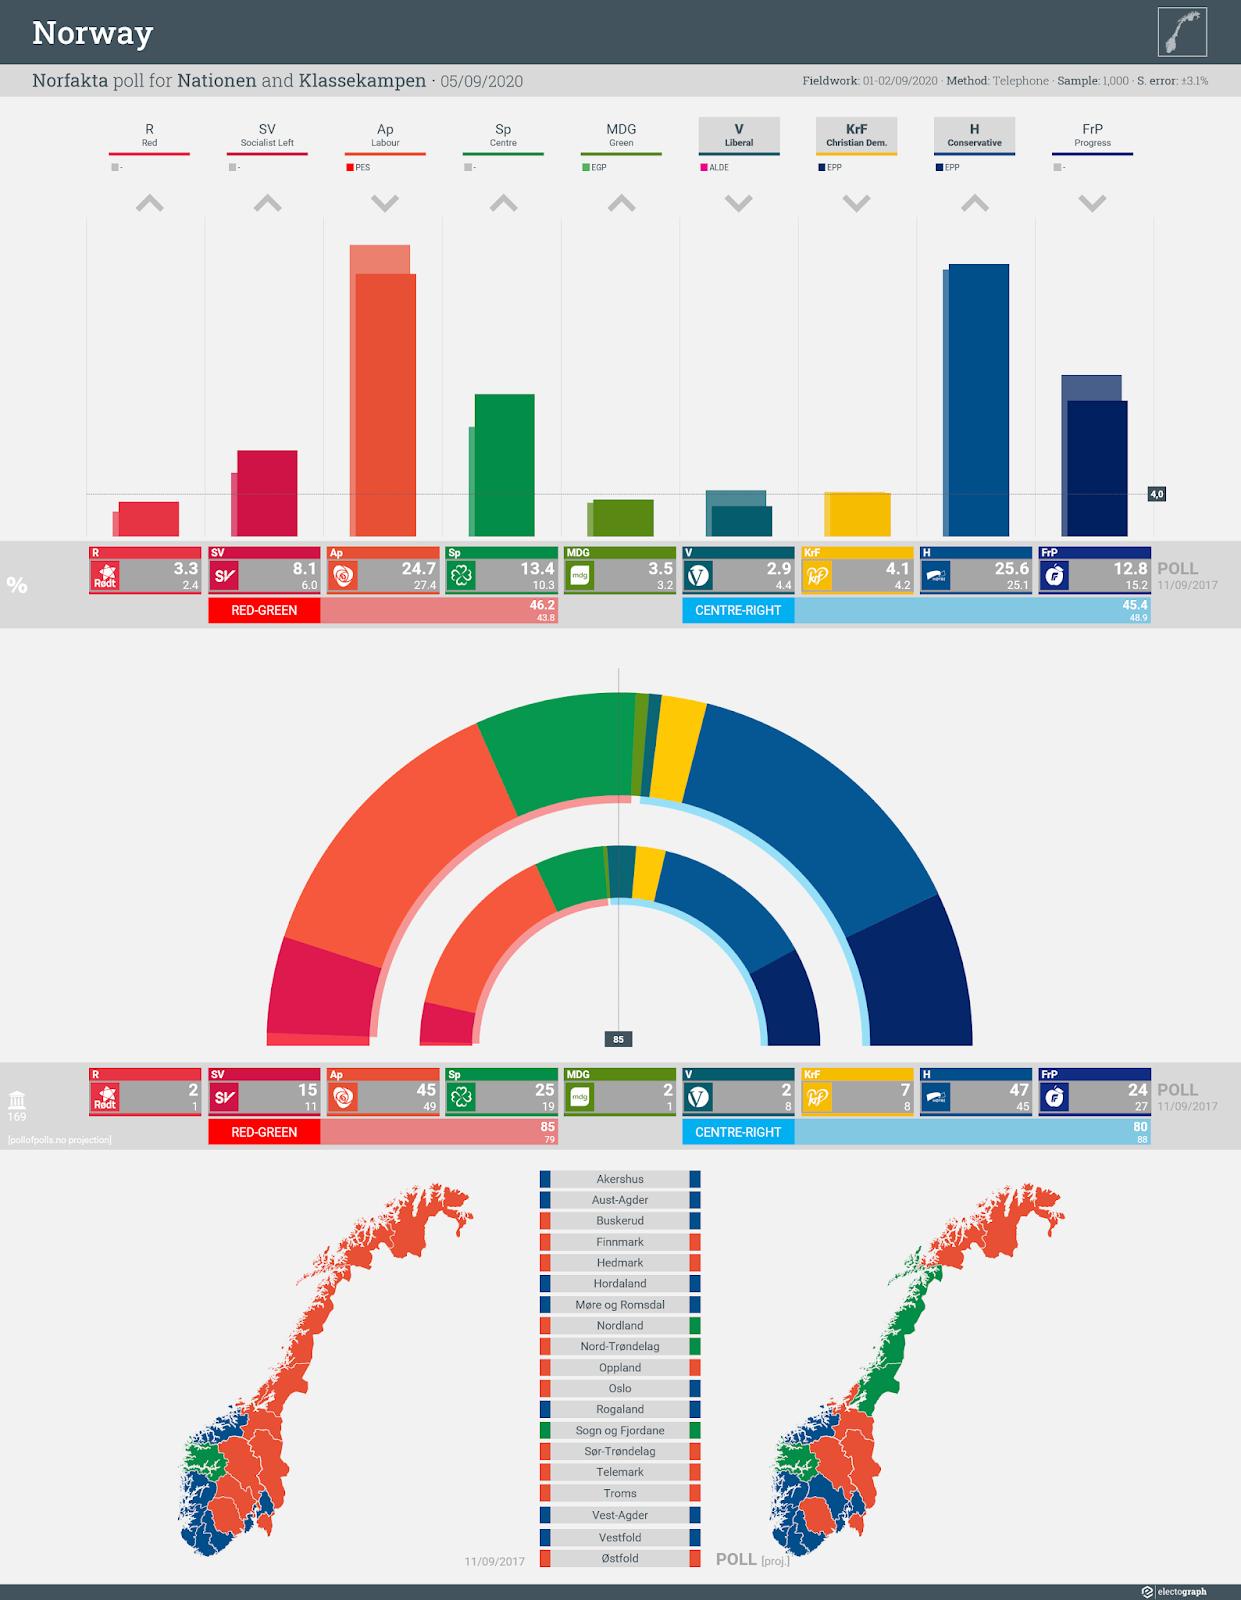 NORWAY: Norfakta poll chart for Nationen and Klassekampen, 5 September 2020